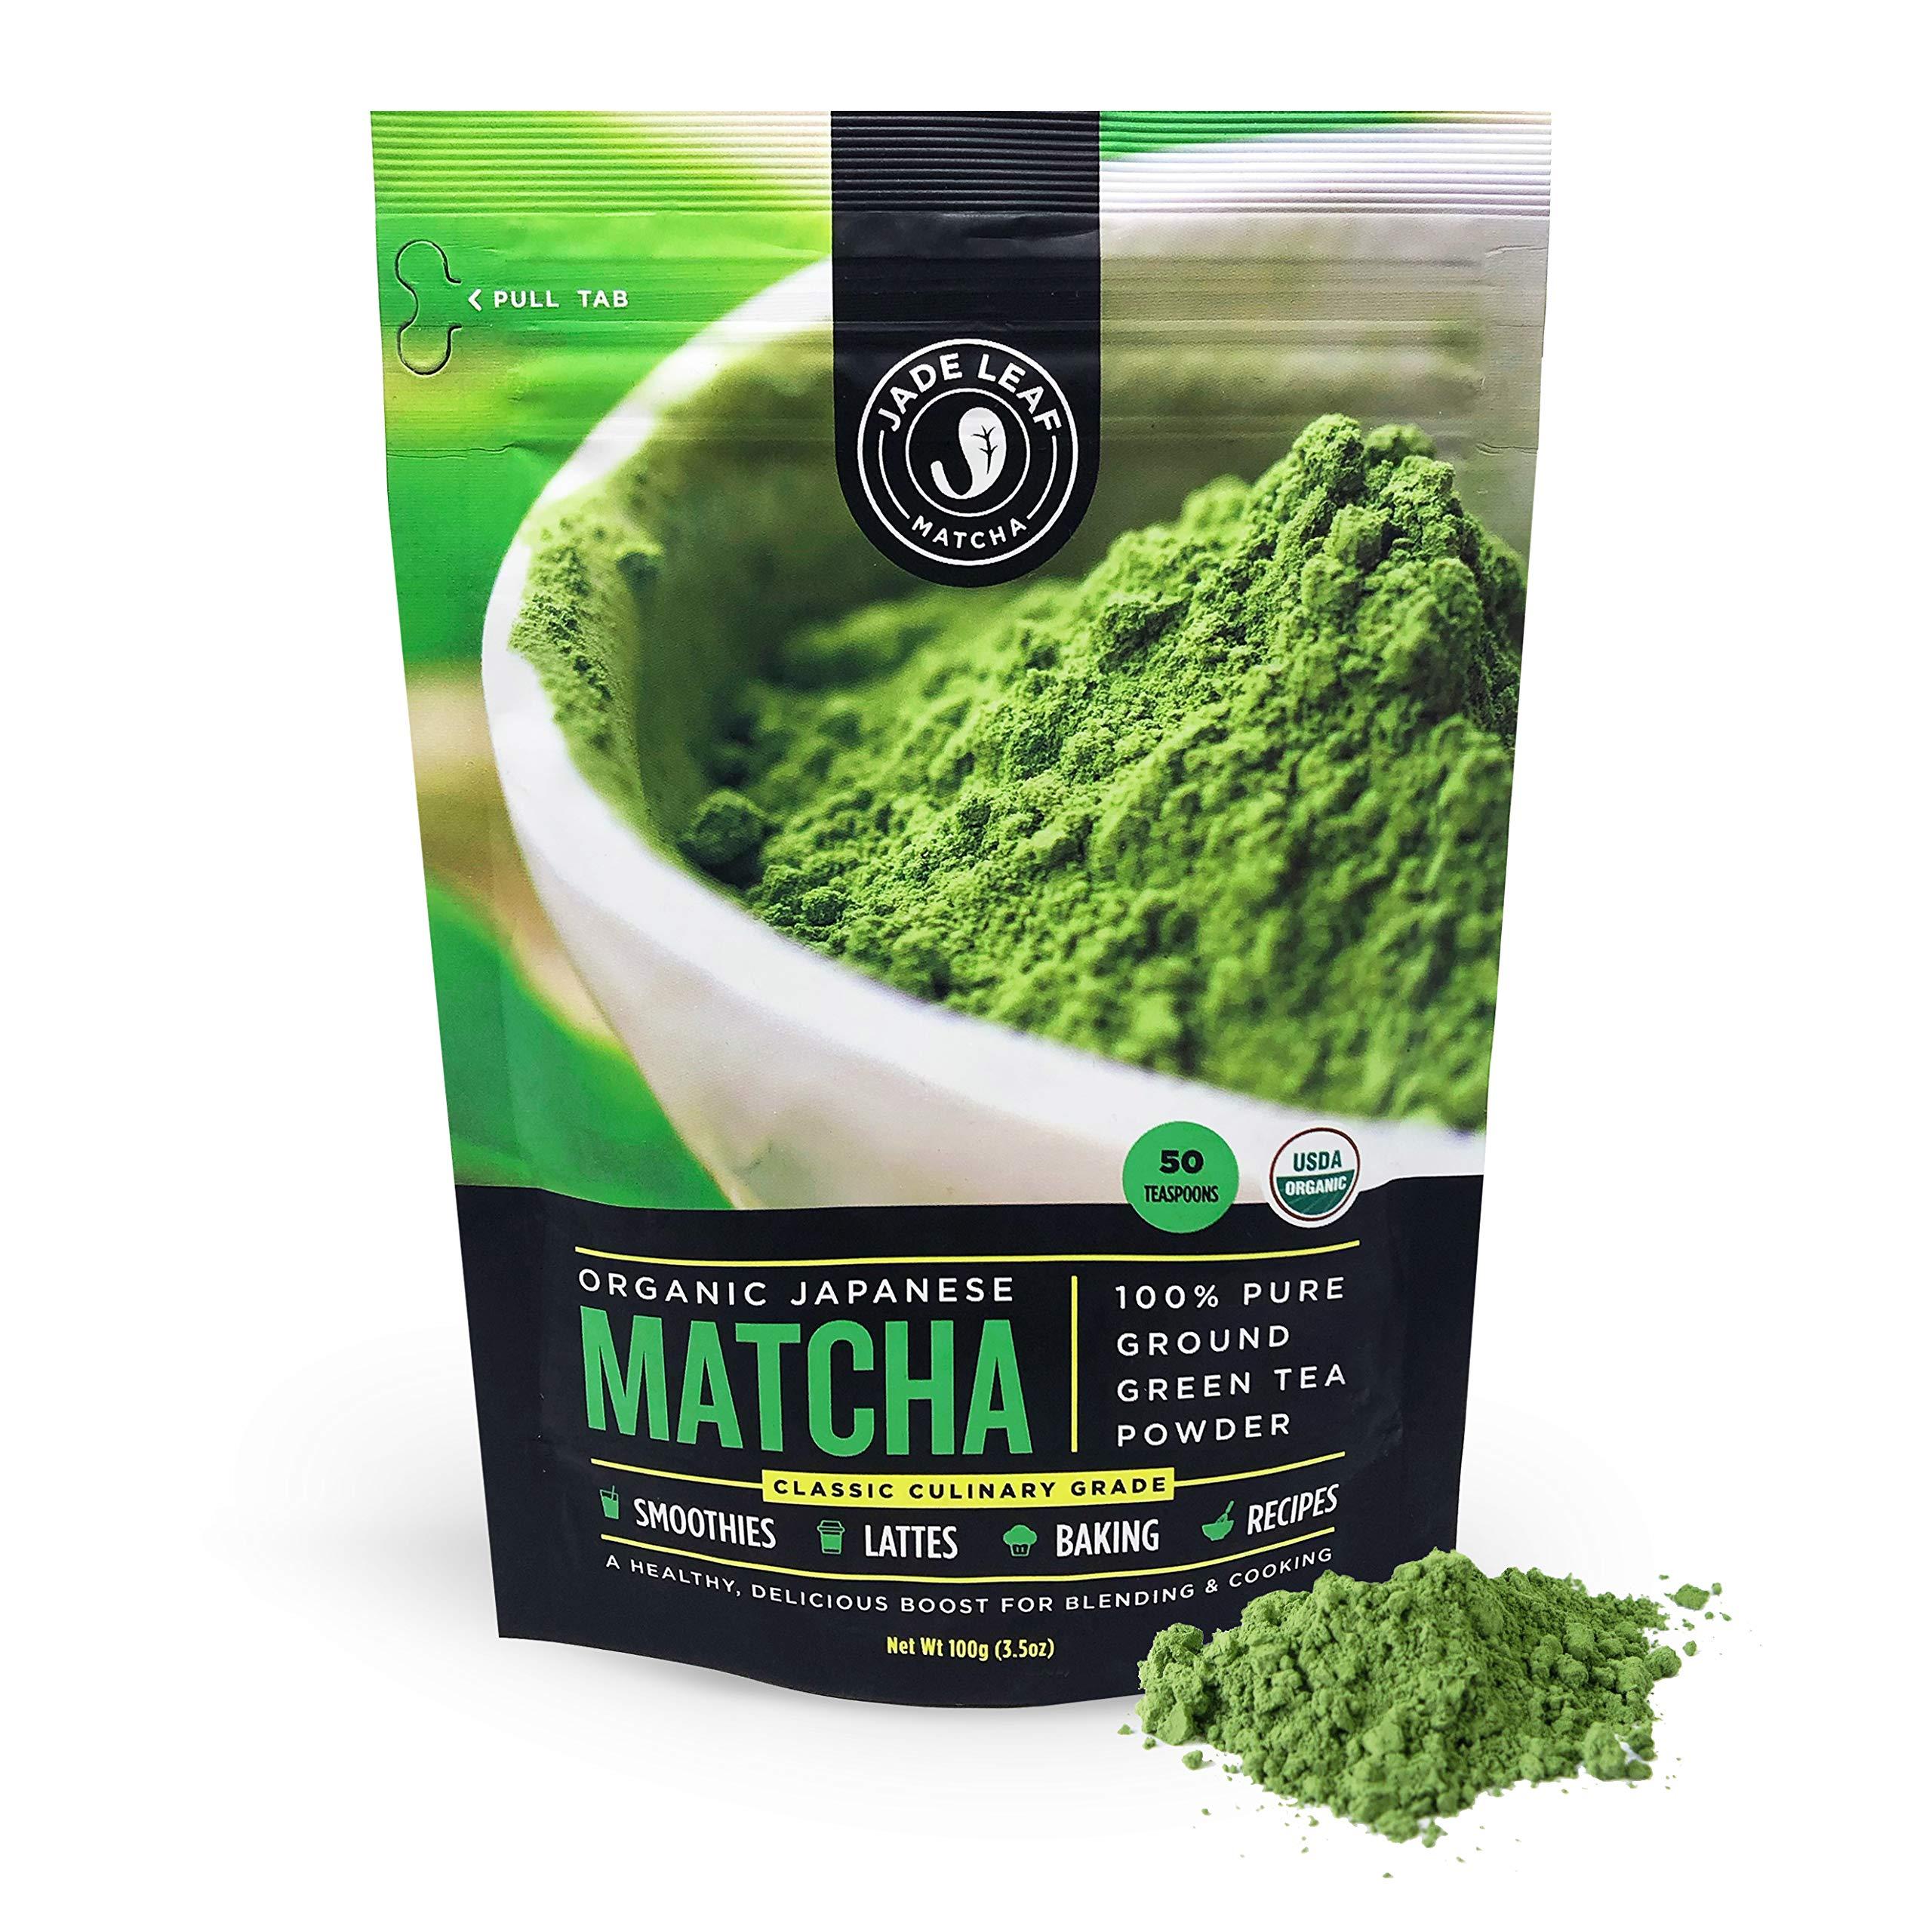 Jade Leaf - Organic Japanese Matcha Green Tea Powder - USDA Certified, Authentic Japanese Origin - Classic Culinary Grade (Smoothies, Lattes, Baking, Recipes) - Antioxidants, Energy [100g Value Size] by Jade Leaf Matcha